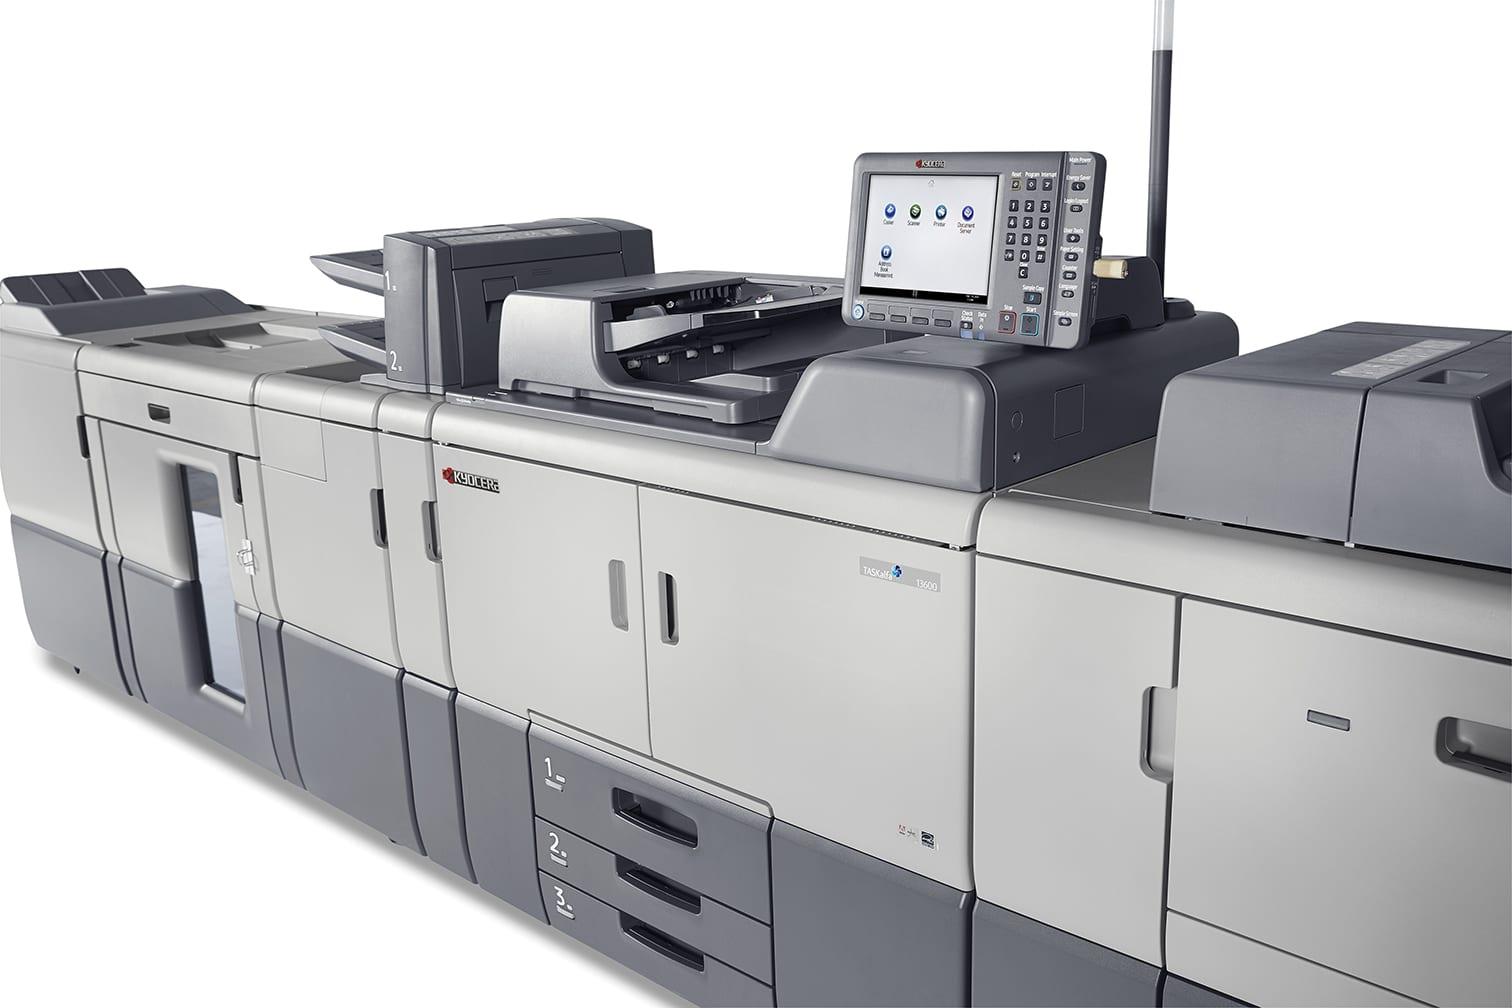 TASKalfa_13600_3QL_Digital - production print